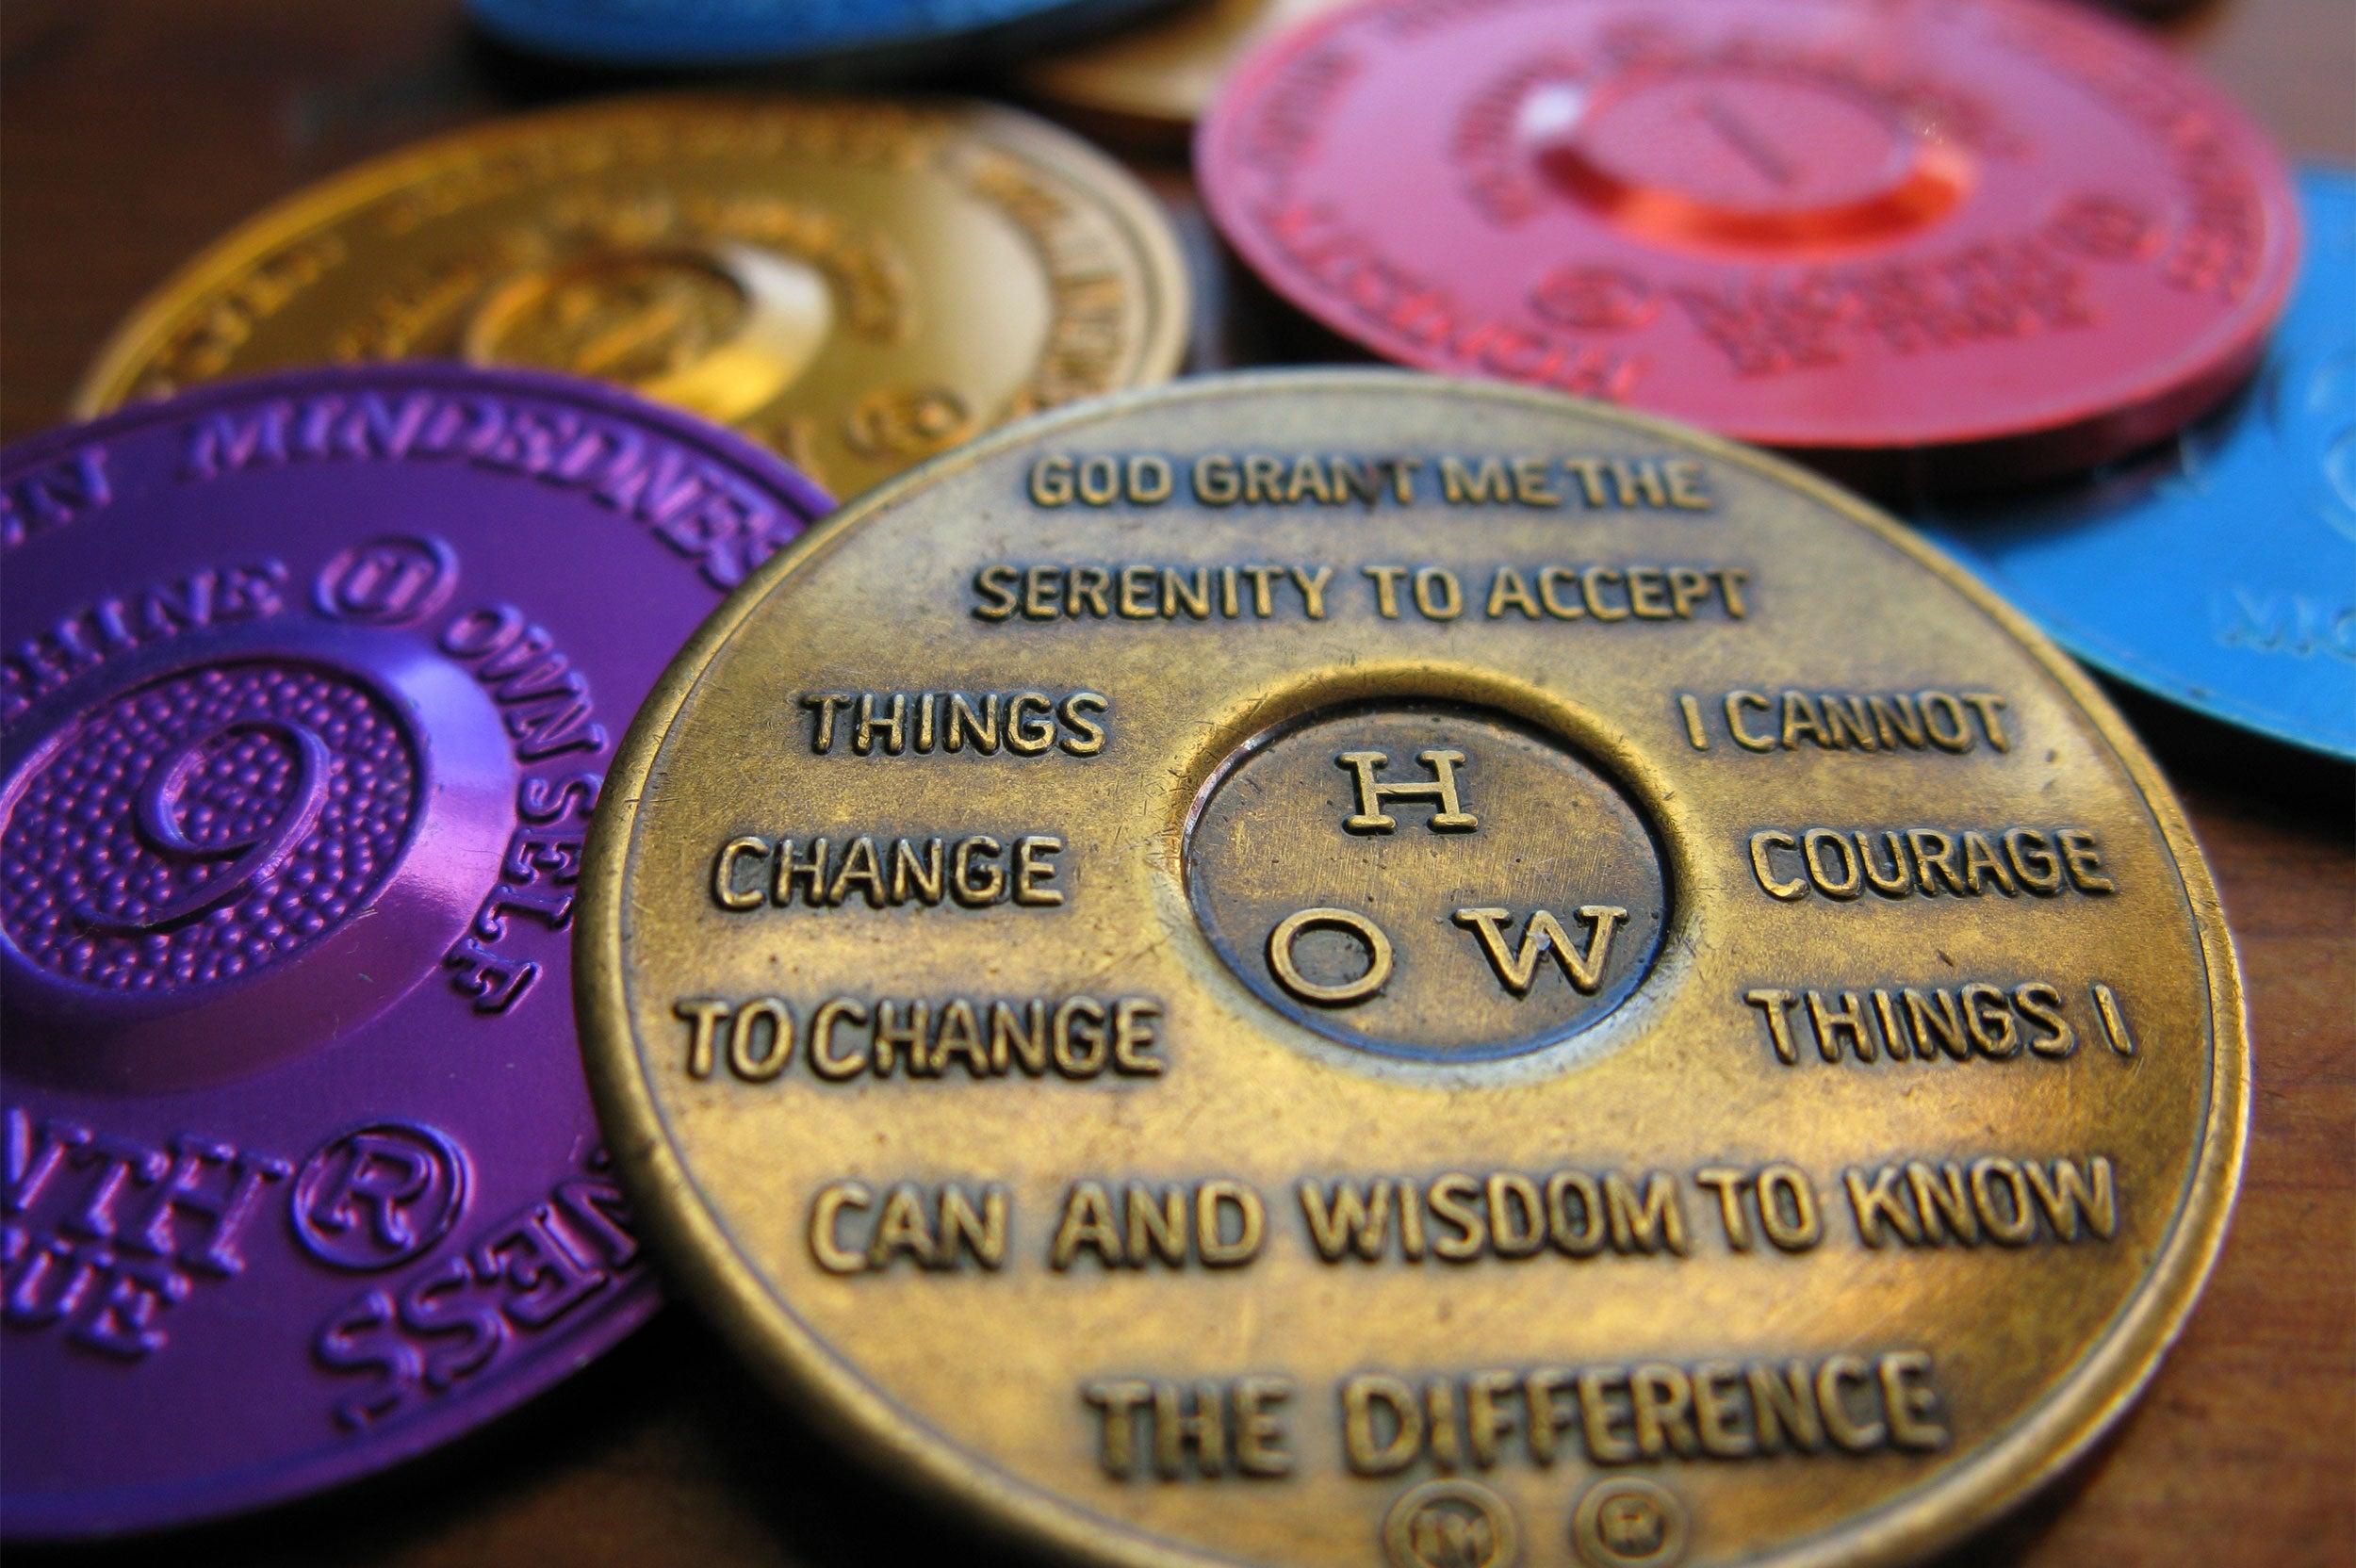 AA medallions